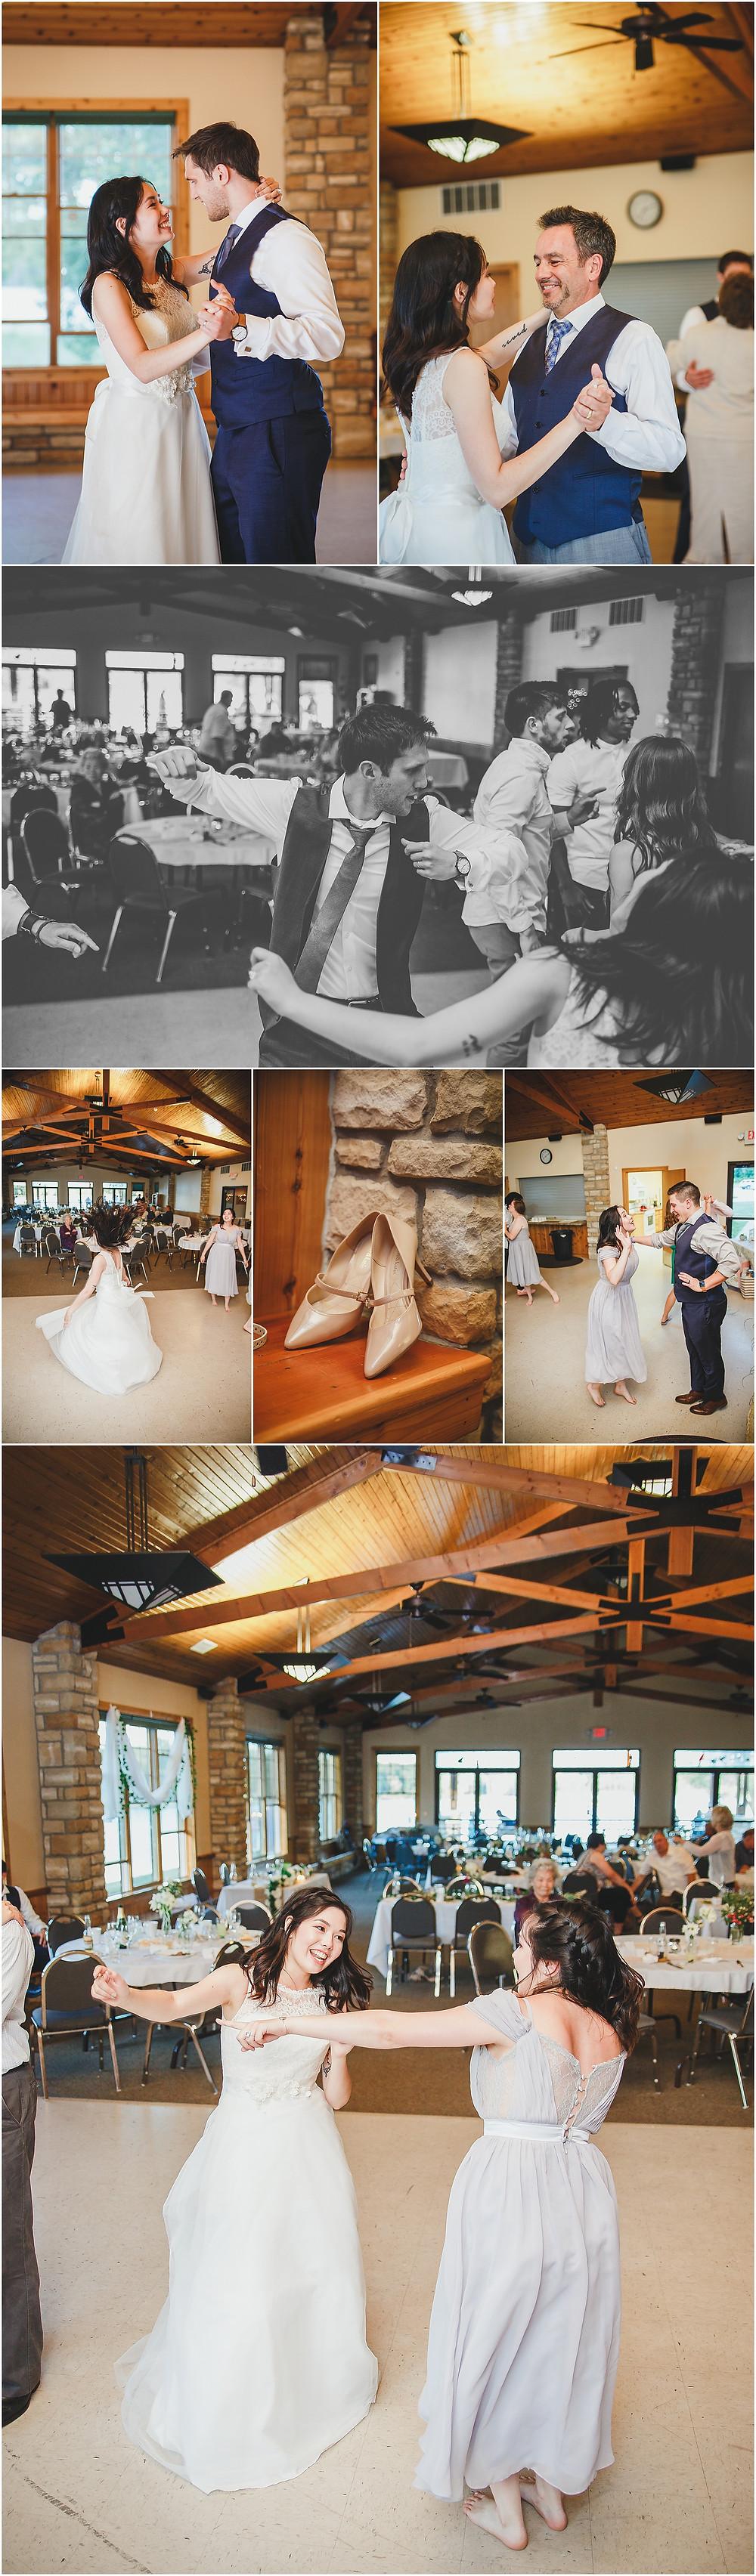 Iowa Wedding Lake Darling Reception